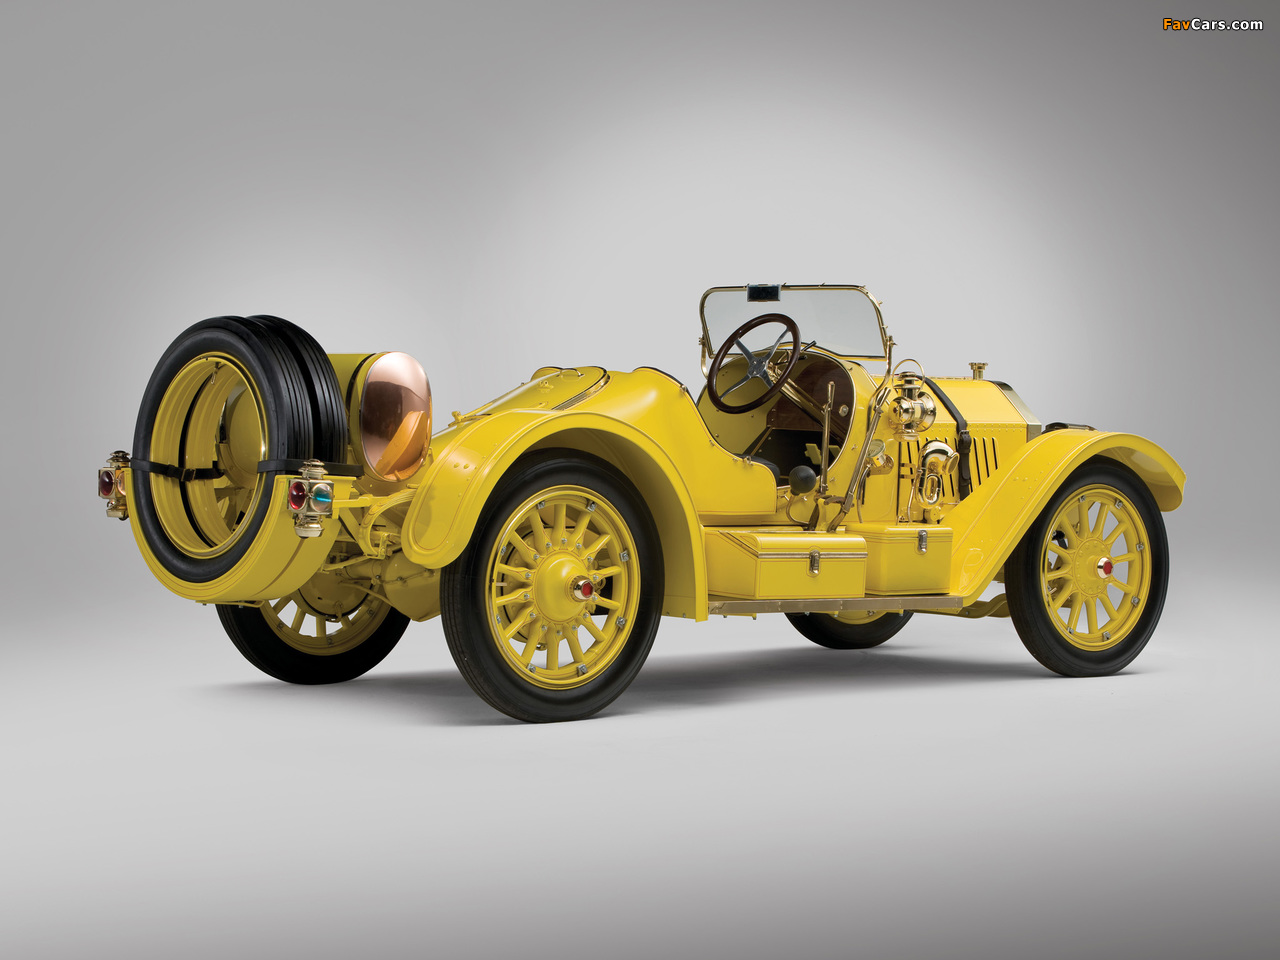 Oldsmobile Autocrat Racing Car 1911 wallpapers (1280 x 960)